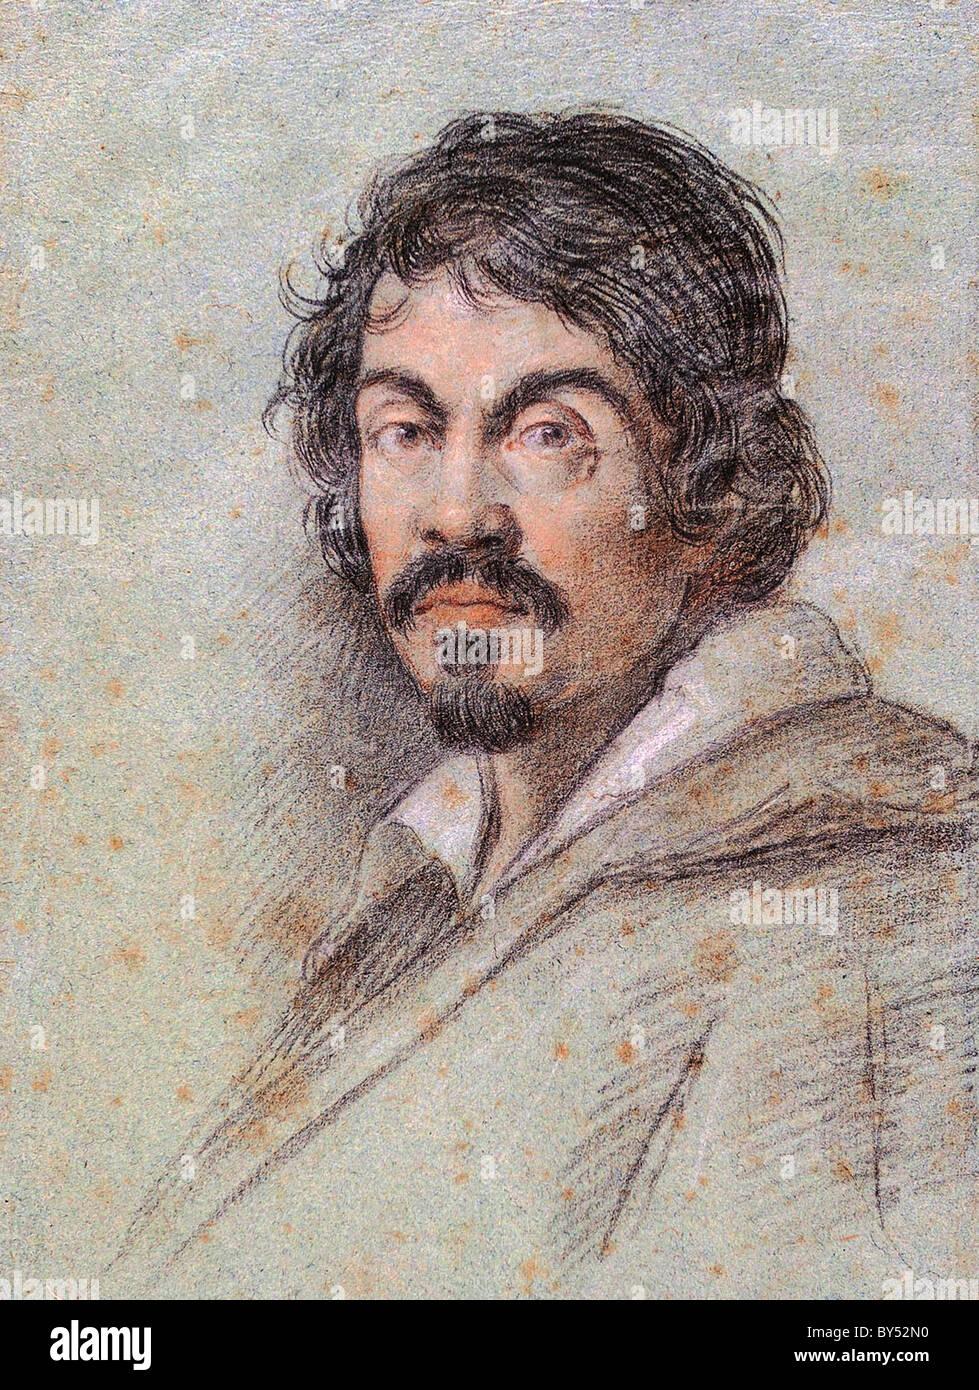 Caravaggio, Michelangelo Merisi da Caravaggio (29 September 1571 – 18 July 1610) was an Italian artist. - Stock Image